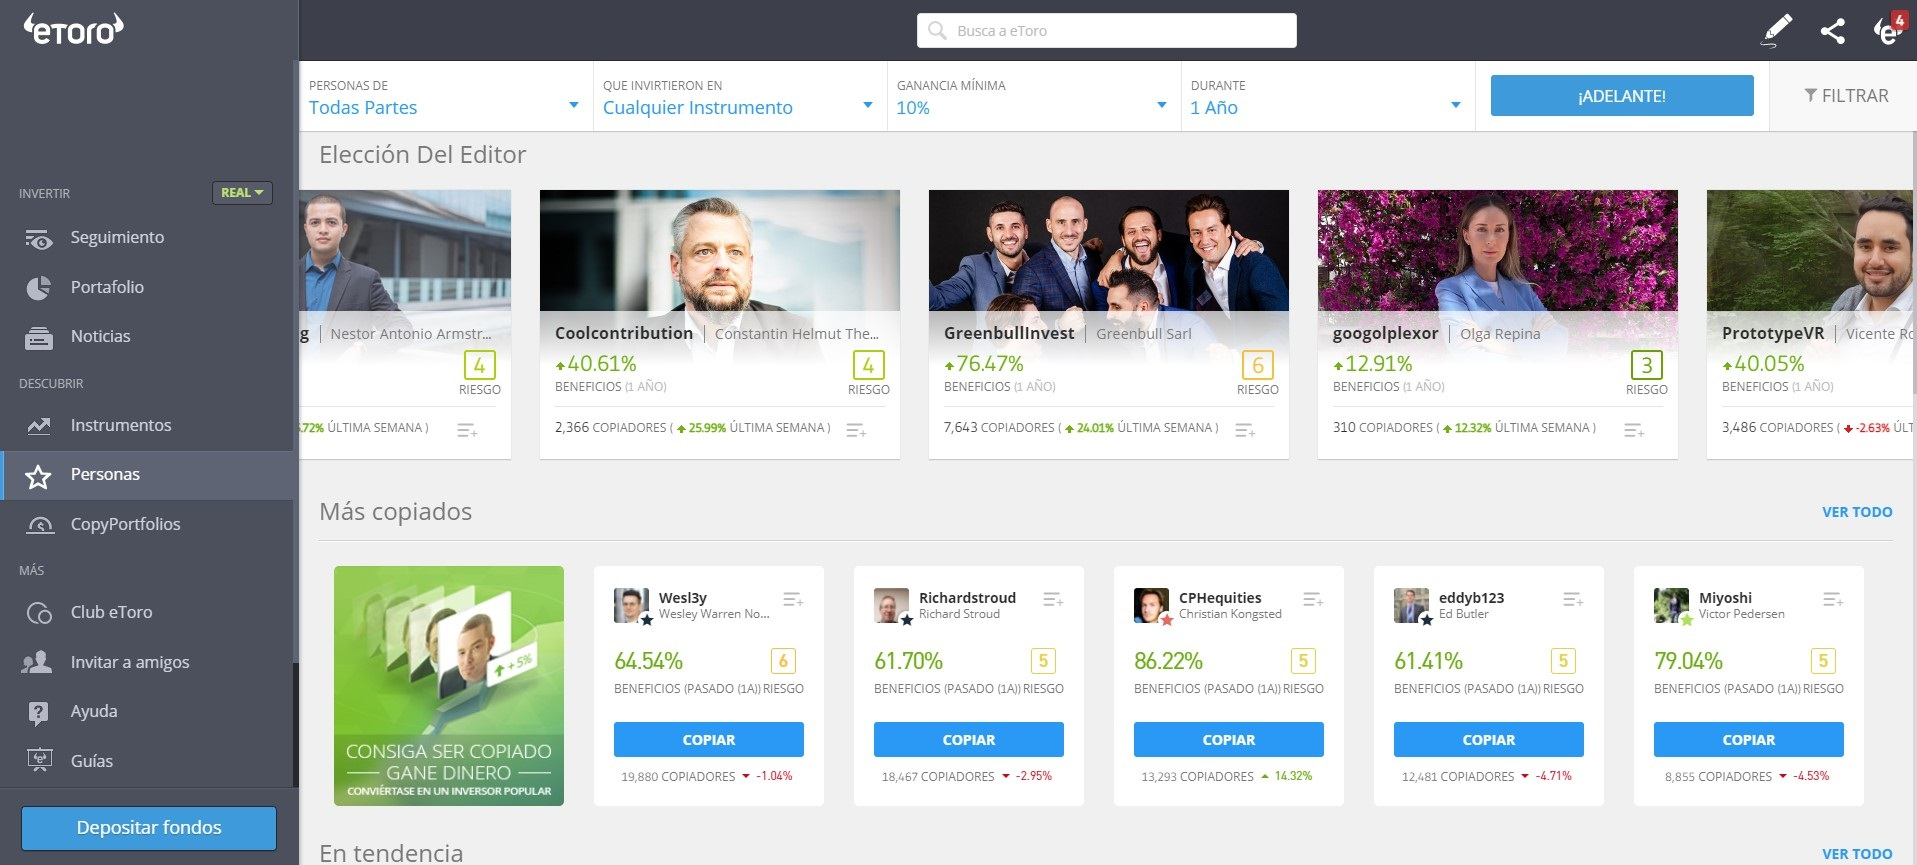 Popular Investor Etoro